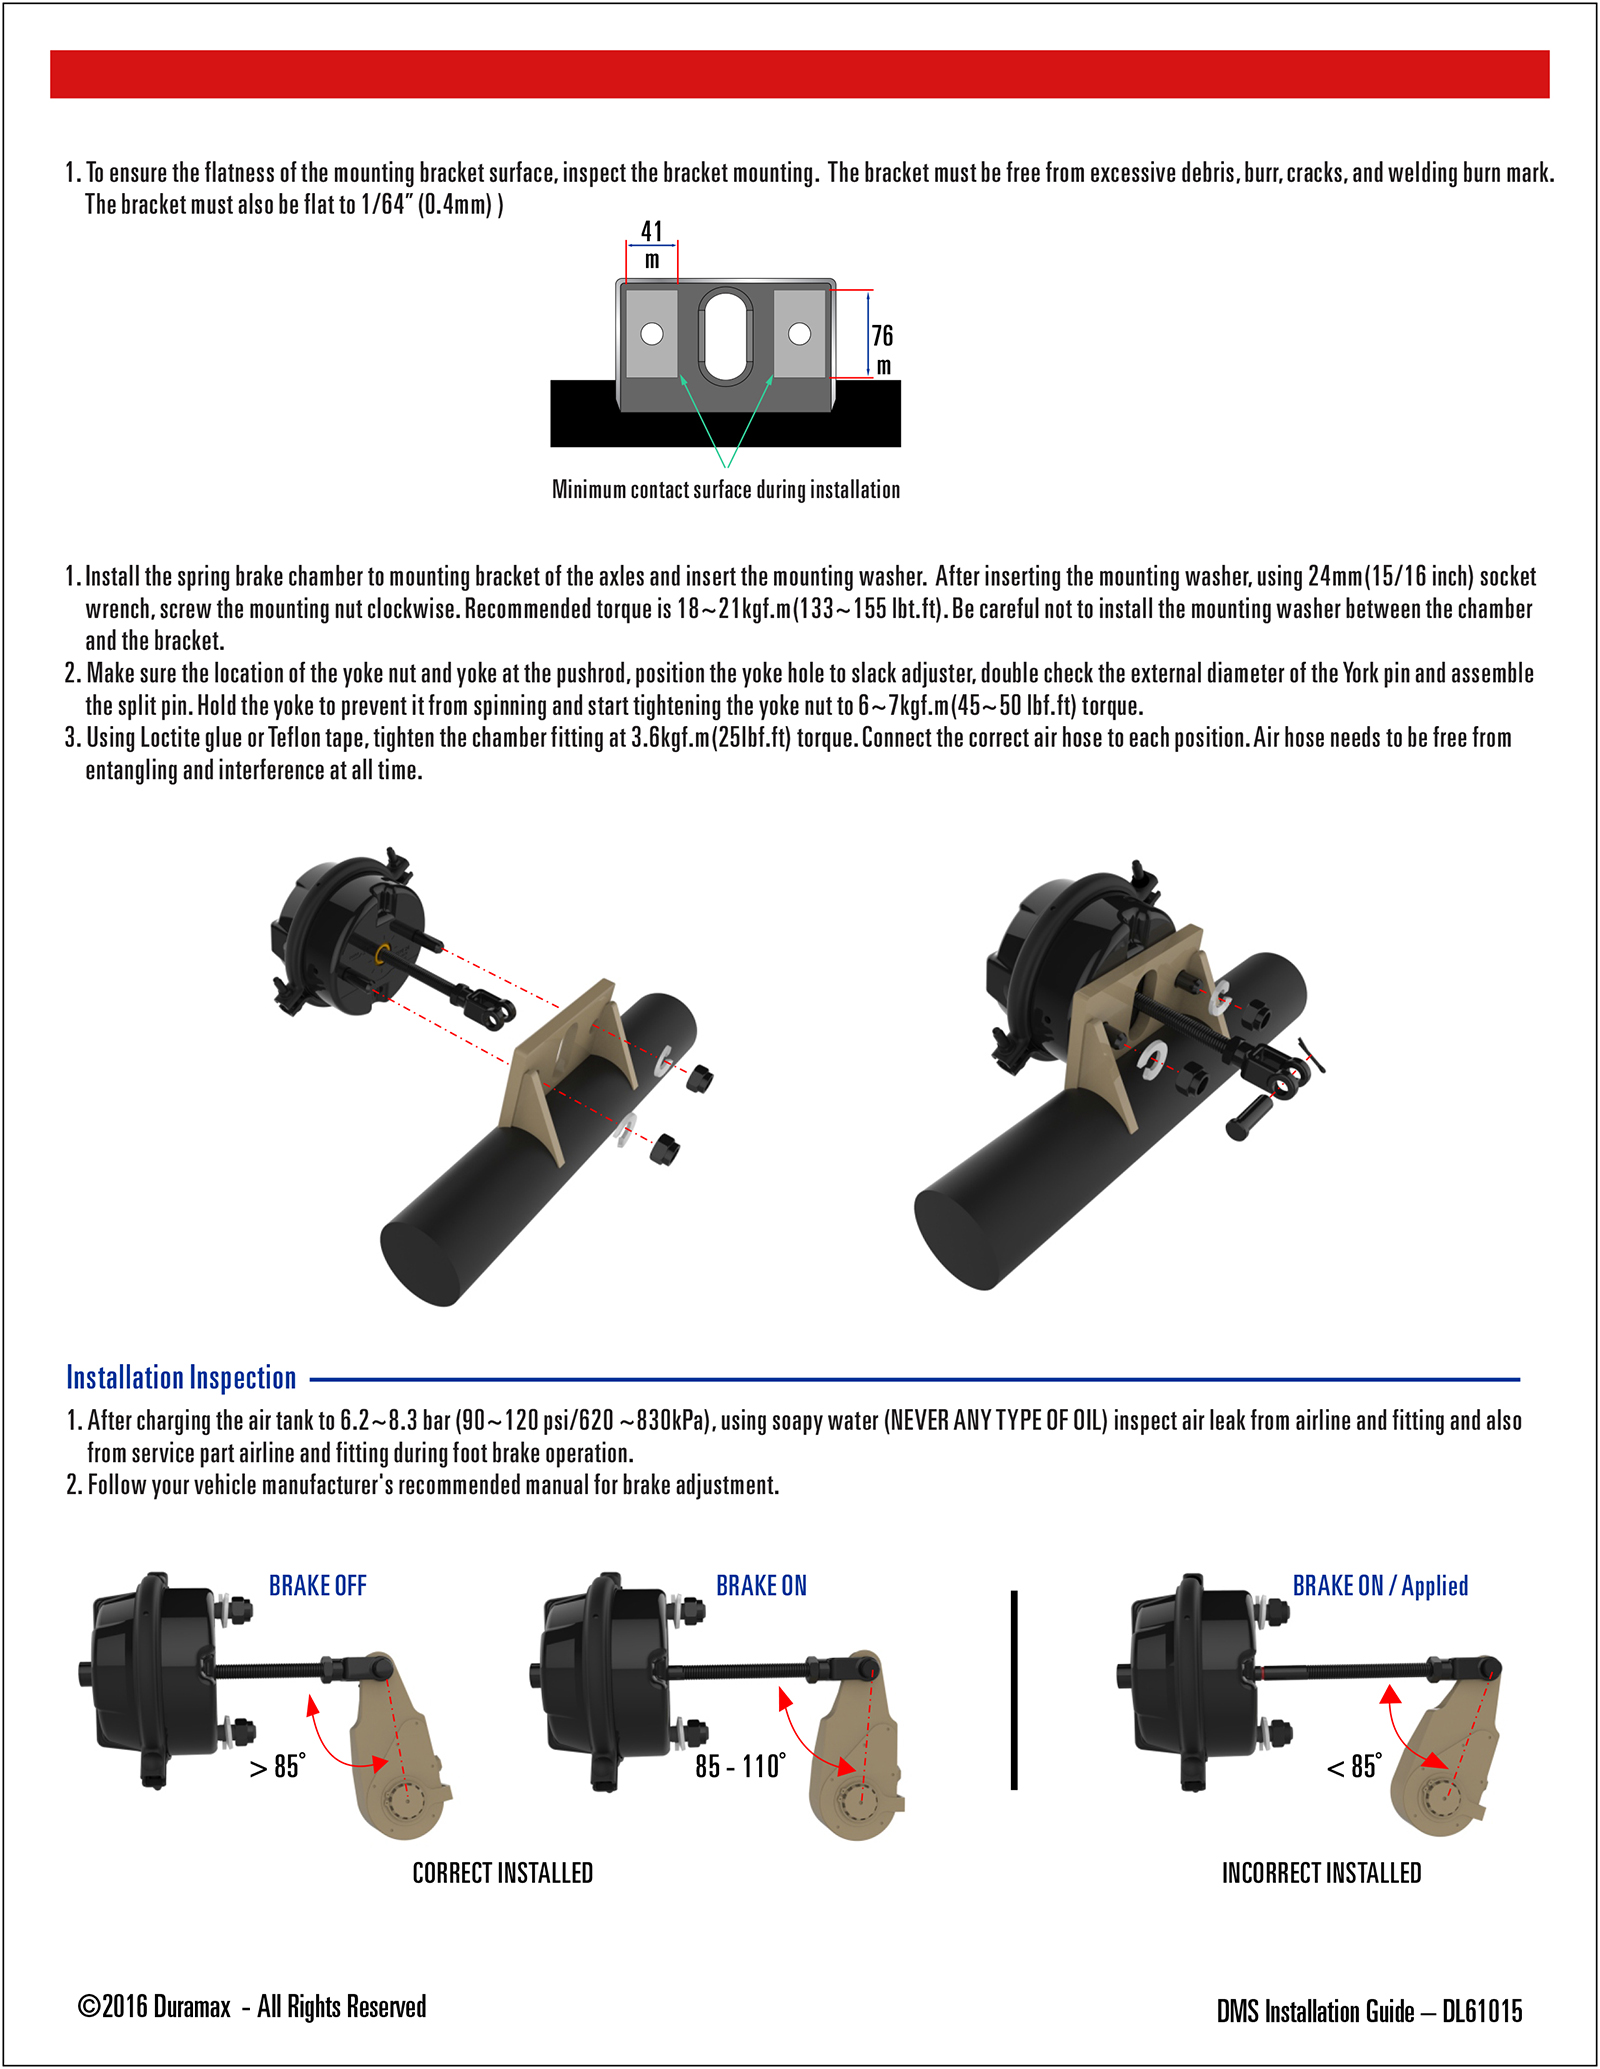 DMS-Intallation-inspection-2.jpg